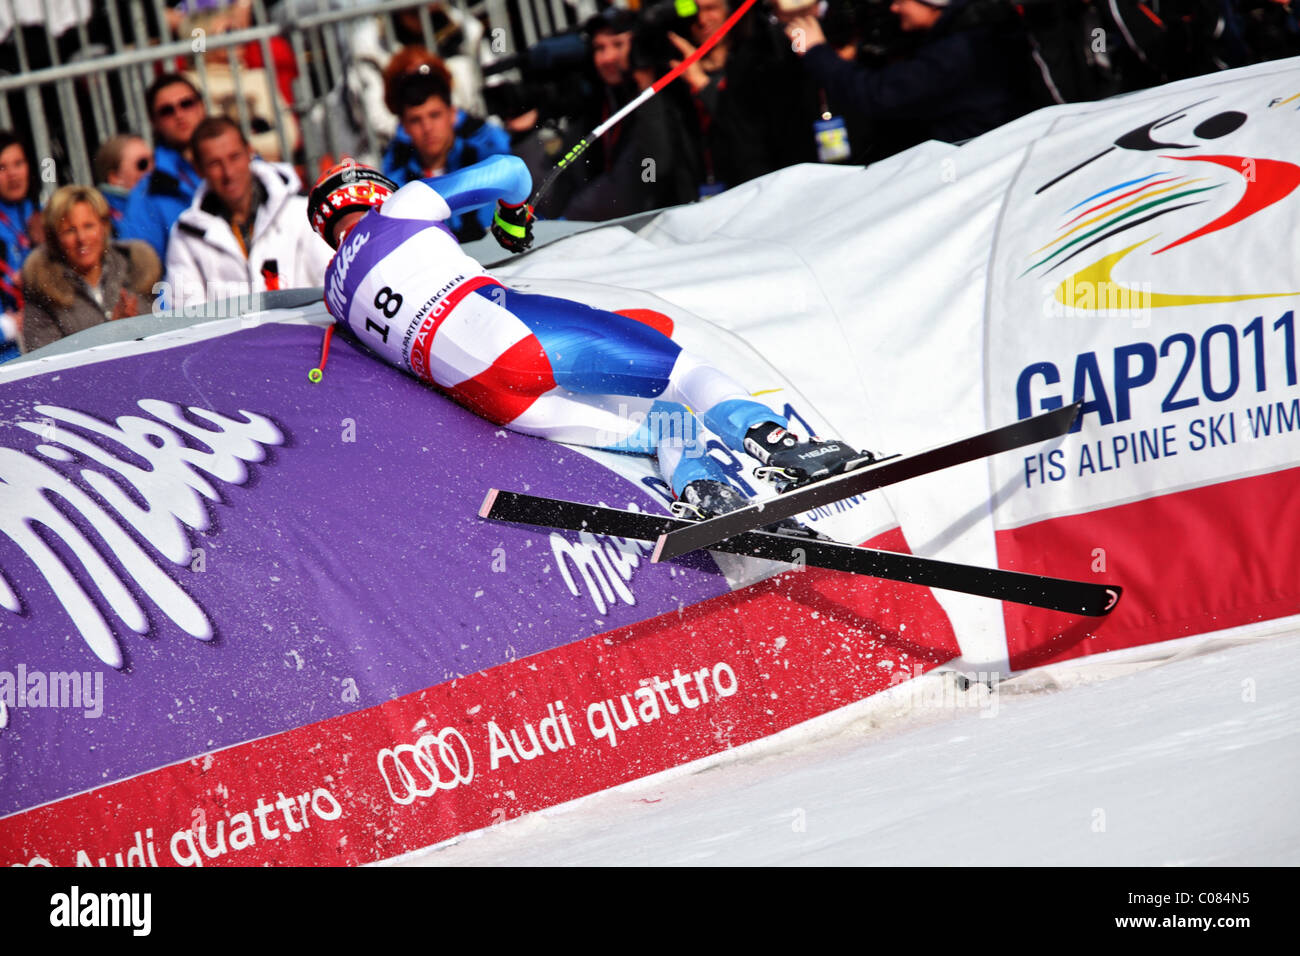 Didier Cuche (SUI) at the FIS Alpine World Ski Championships 2011 - Stock Image